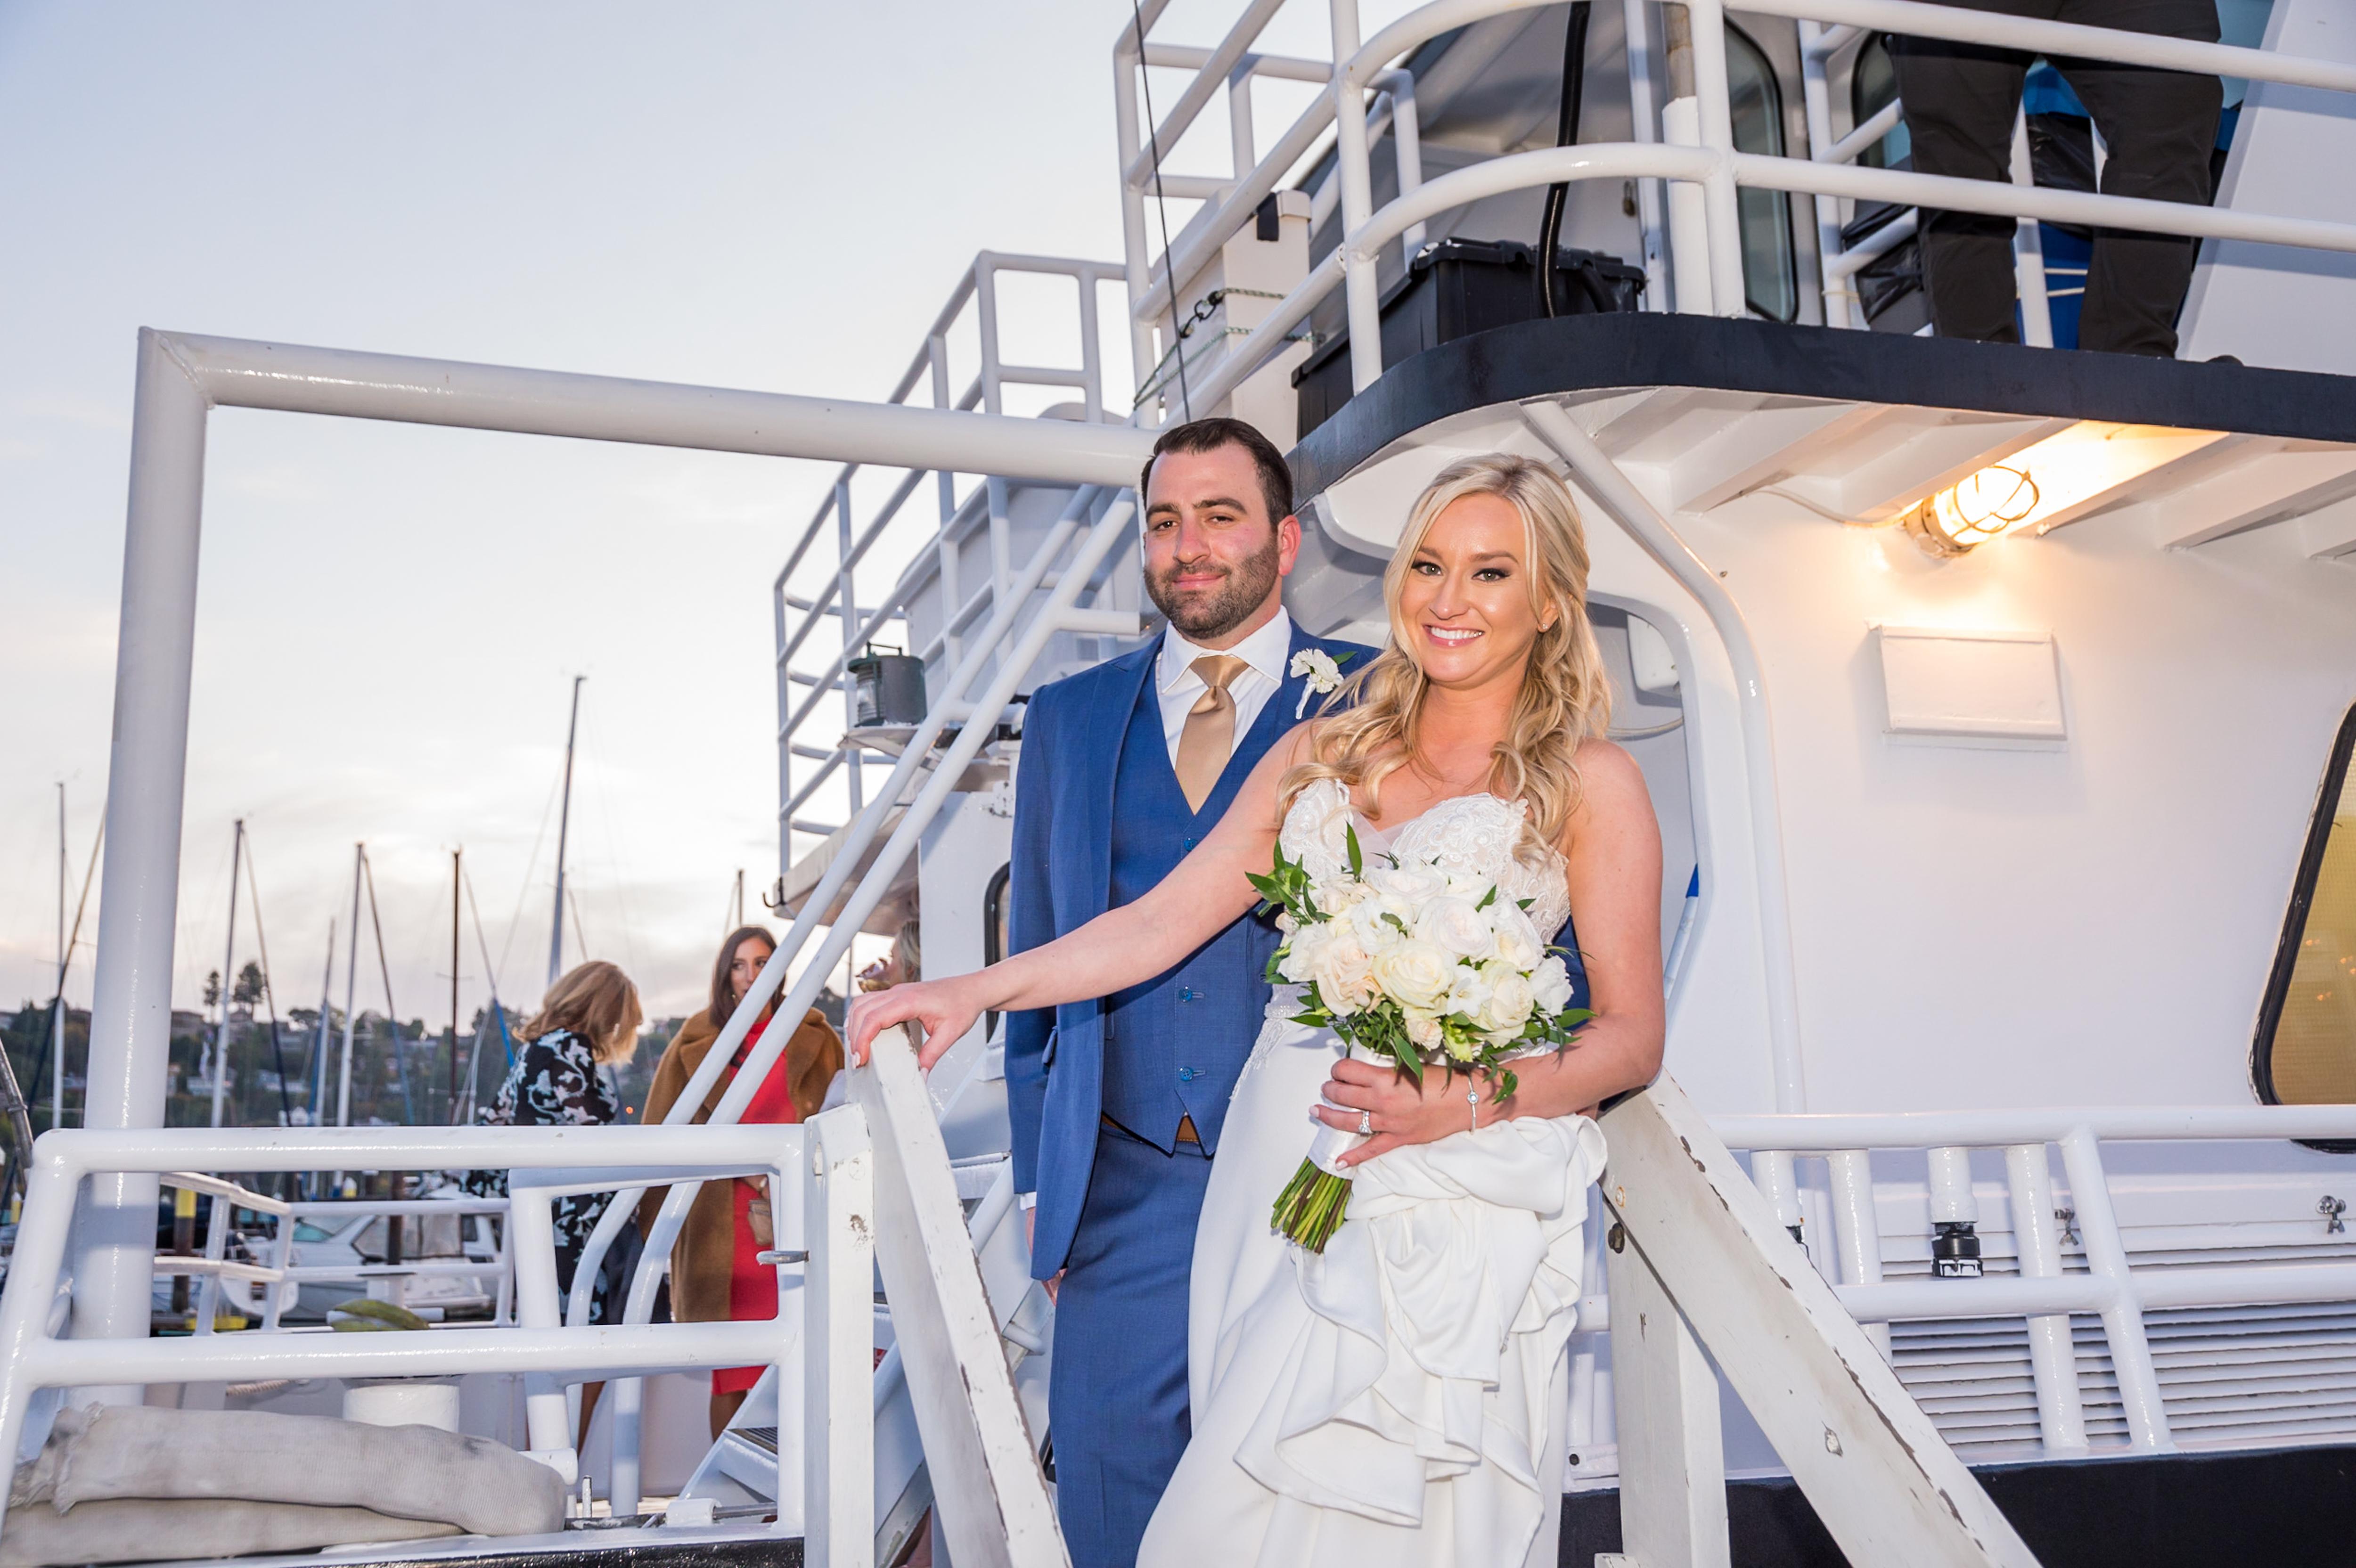 http://fusionmoments.com/2019/10/sarah-justins-wedding/